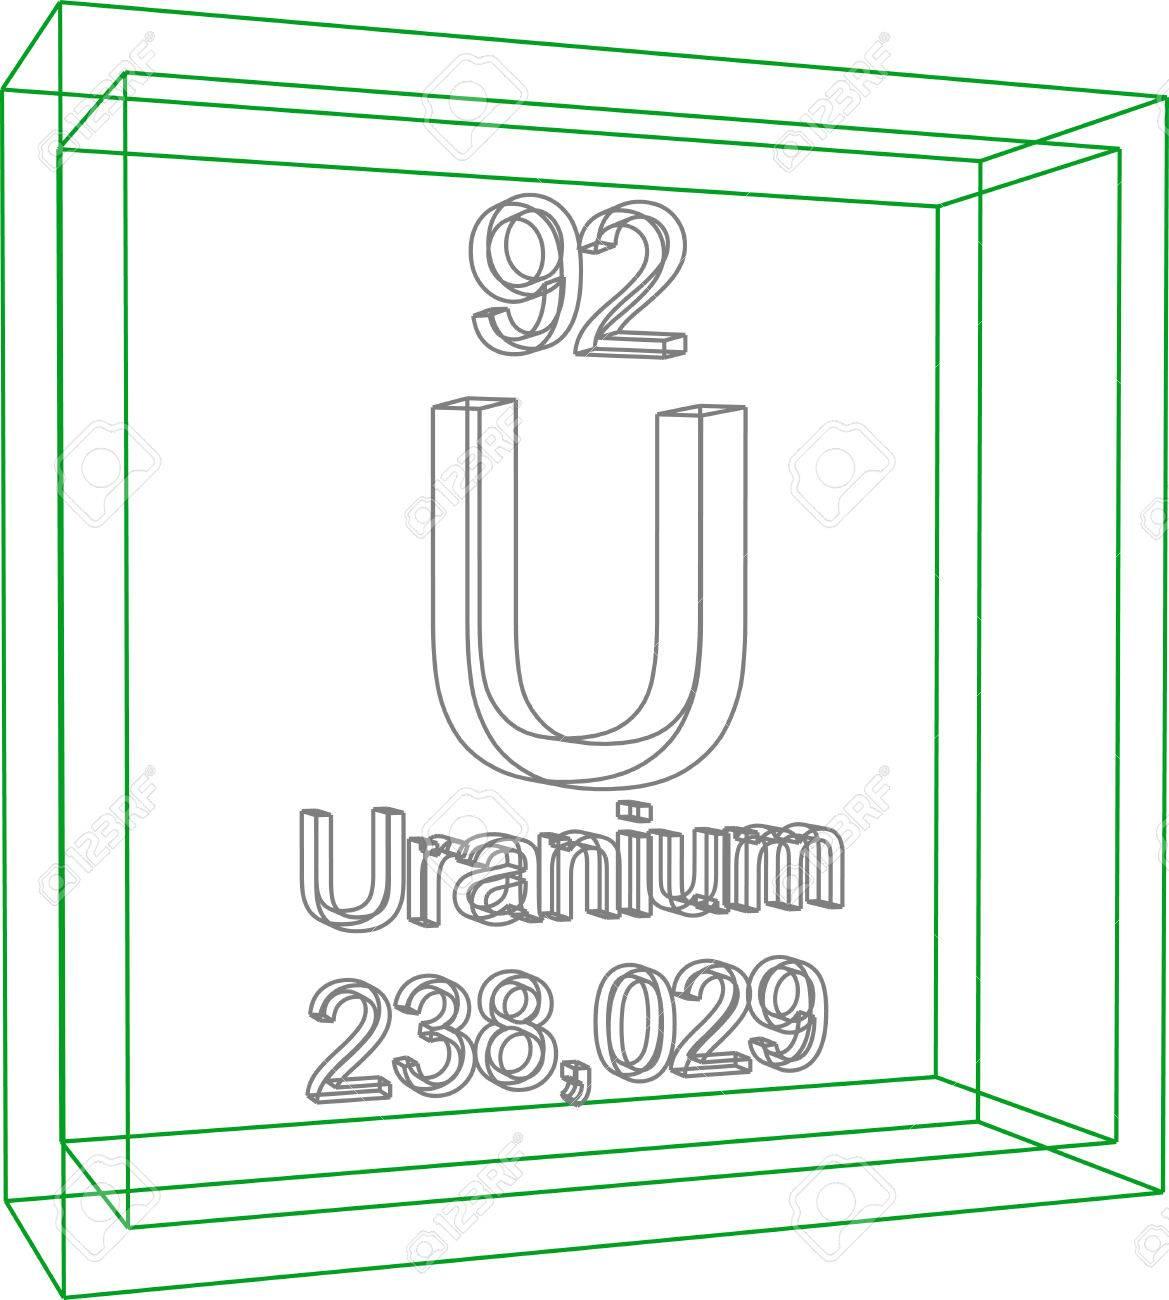 Periodic table of elements uranium royalty free cliparts vectors periodic table of elements uranium stock vector 57970975 urtaz Choice Image